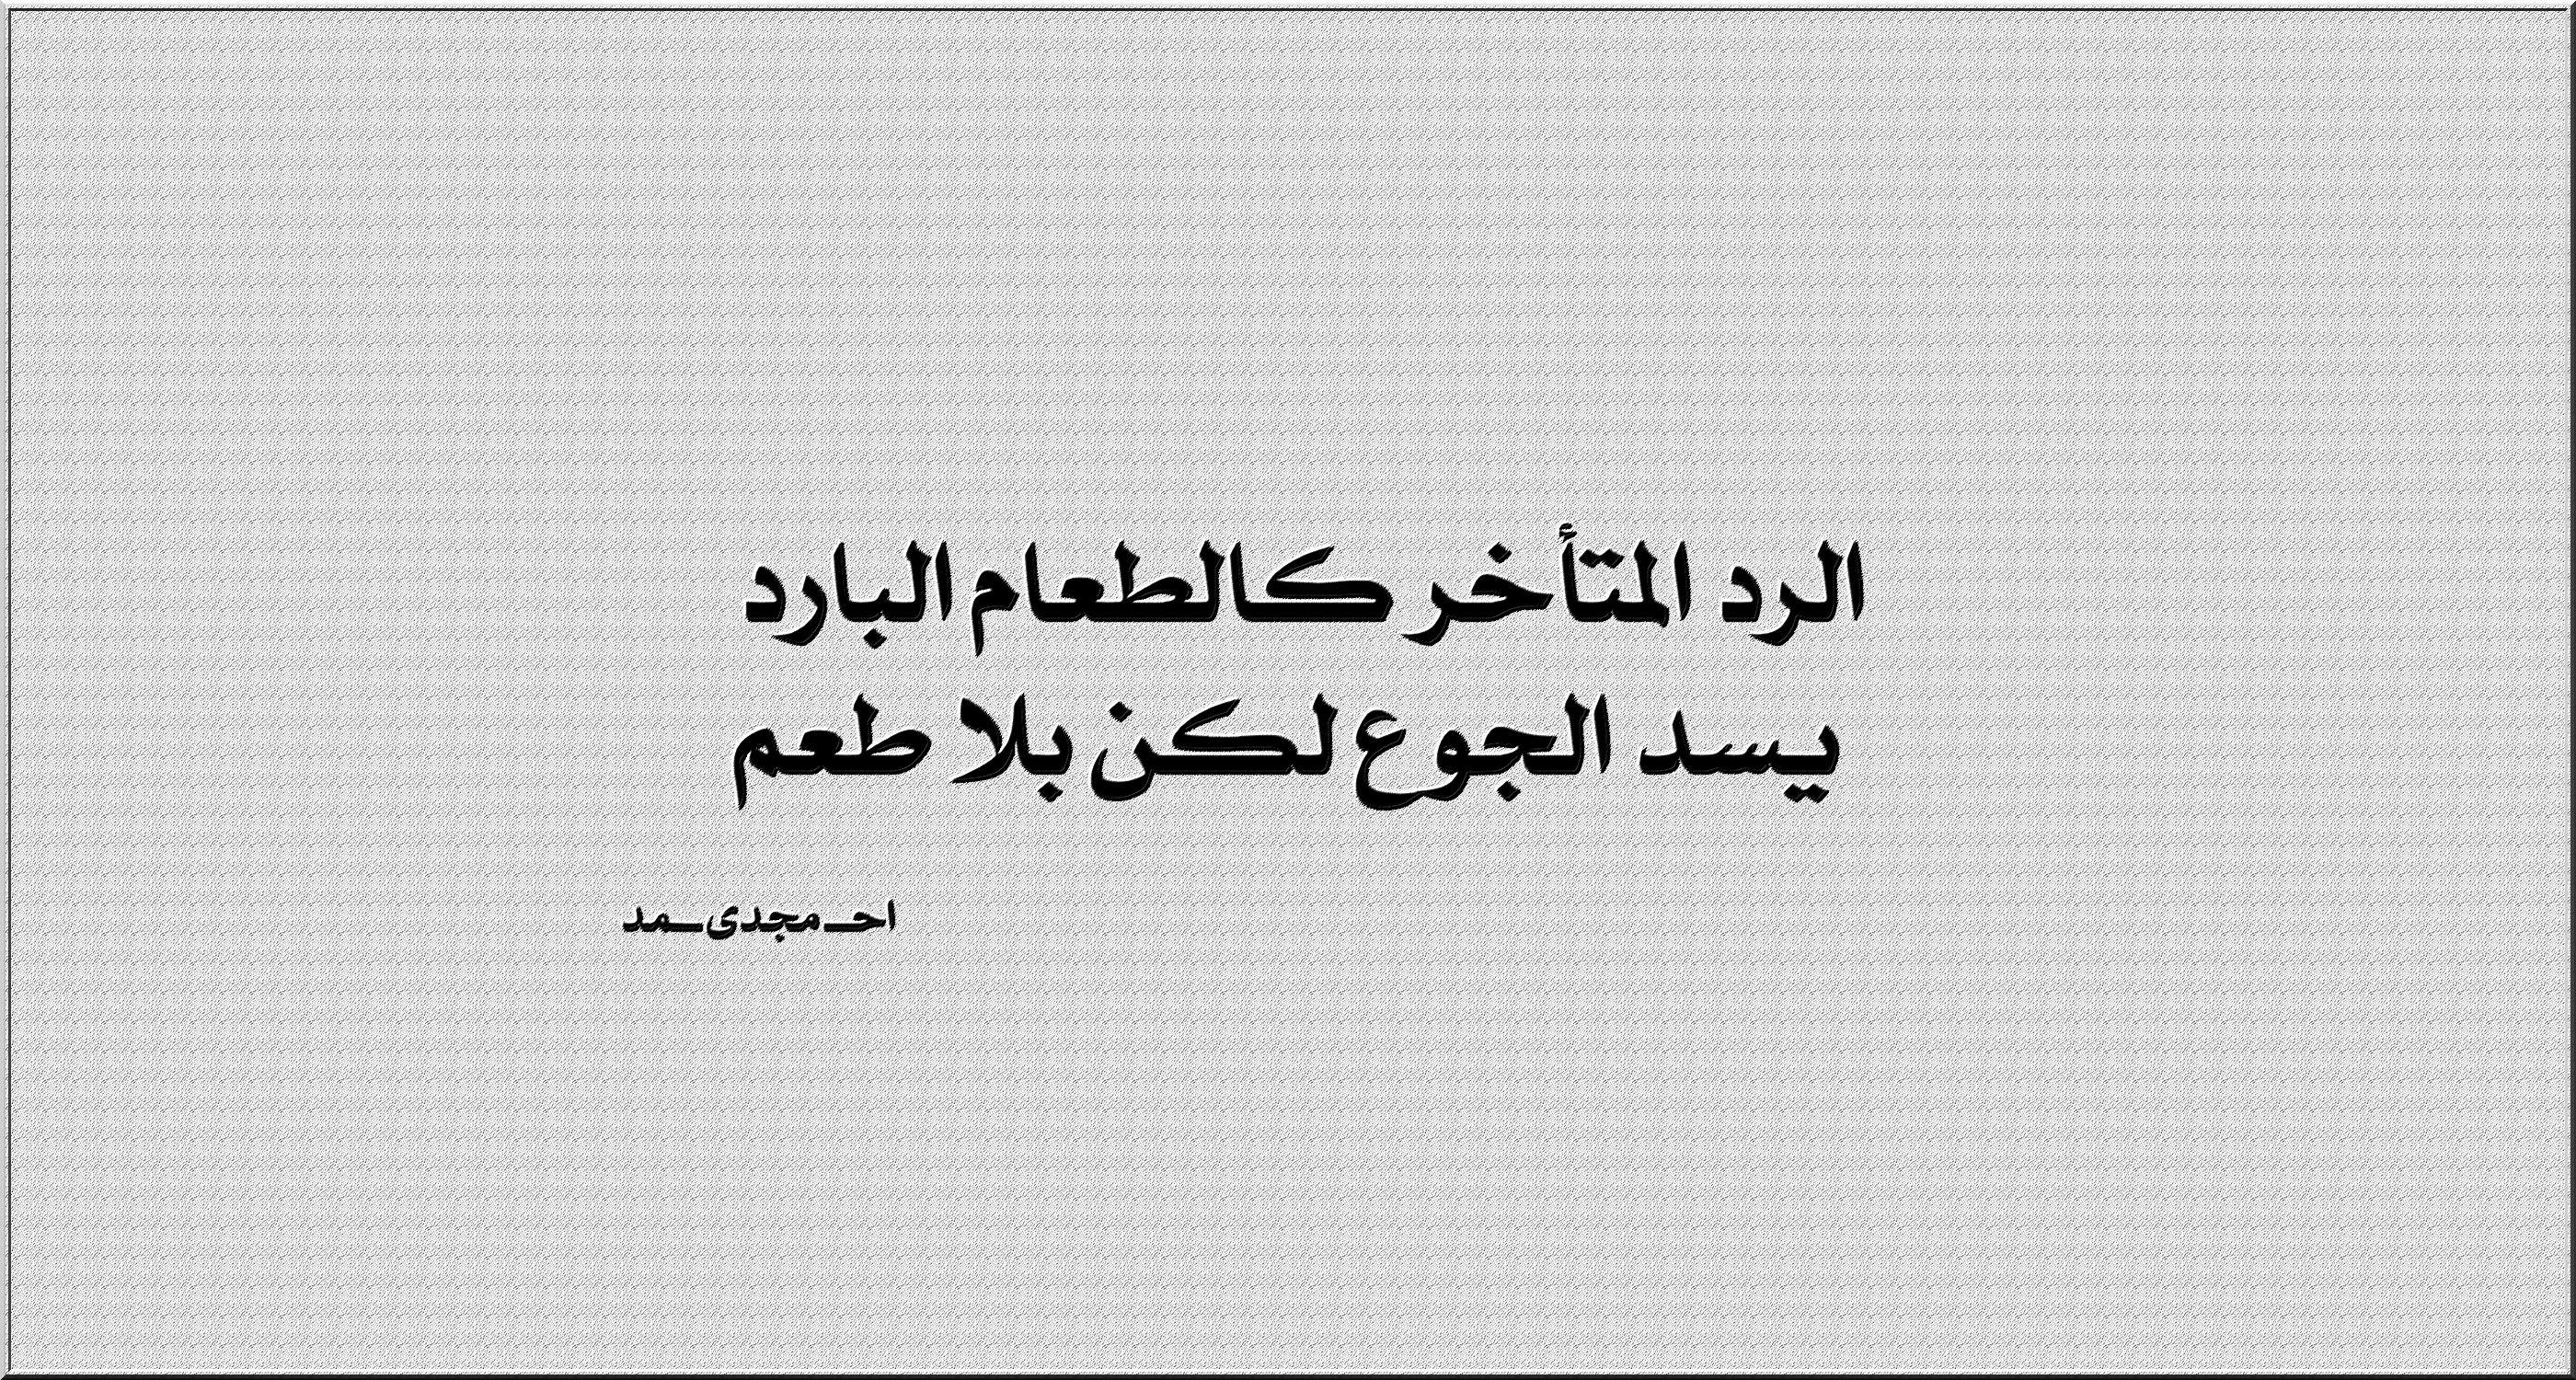 الرد المتأخر Arabic Quotes Quotes Patchouli Perfume